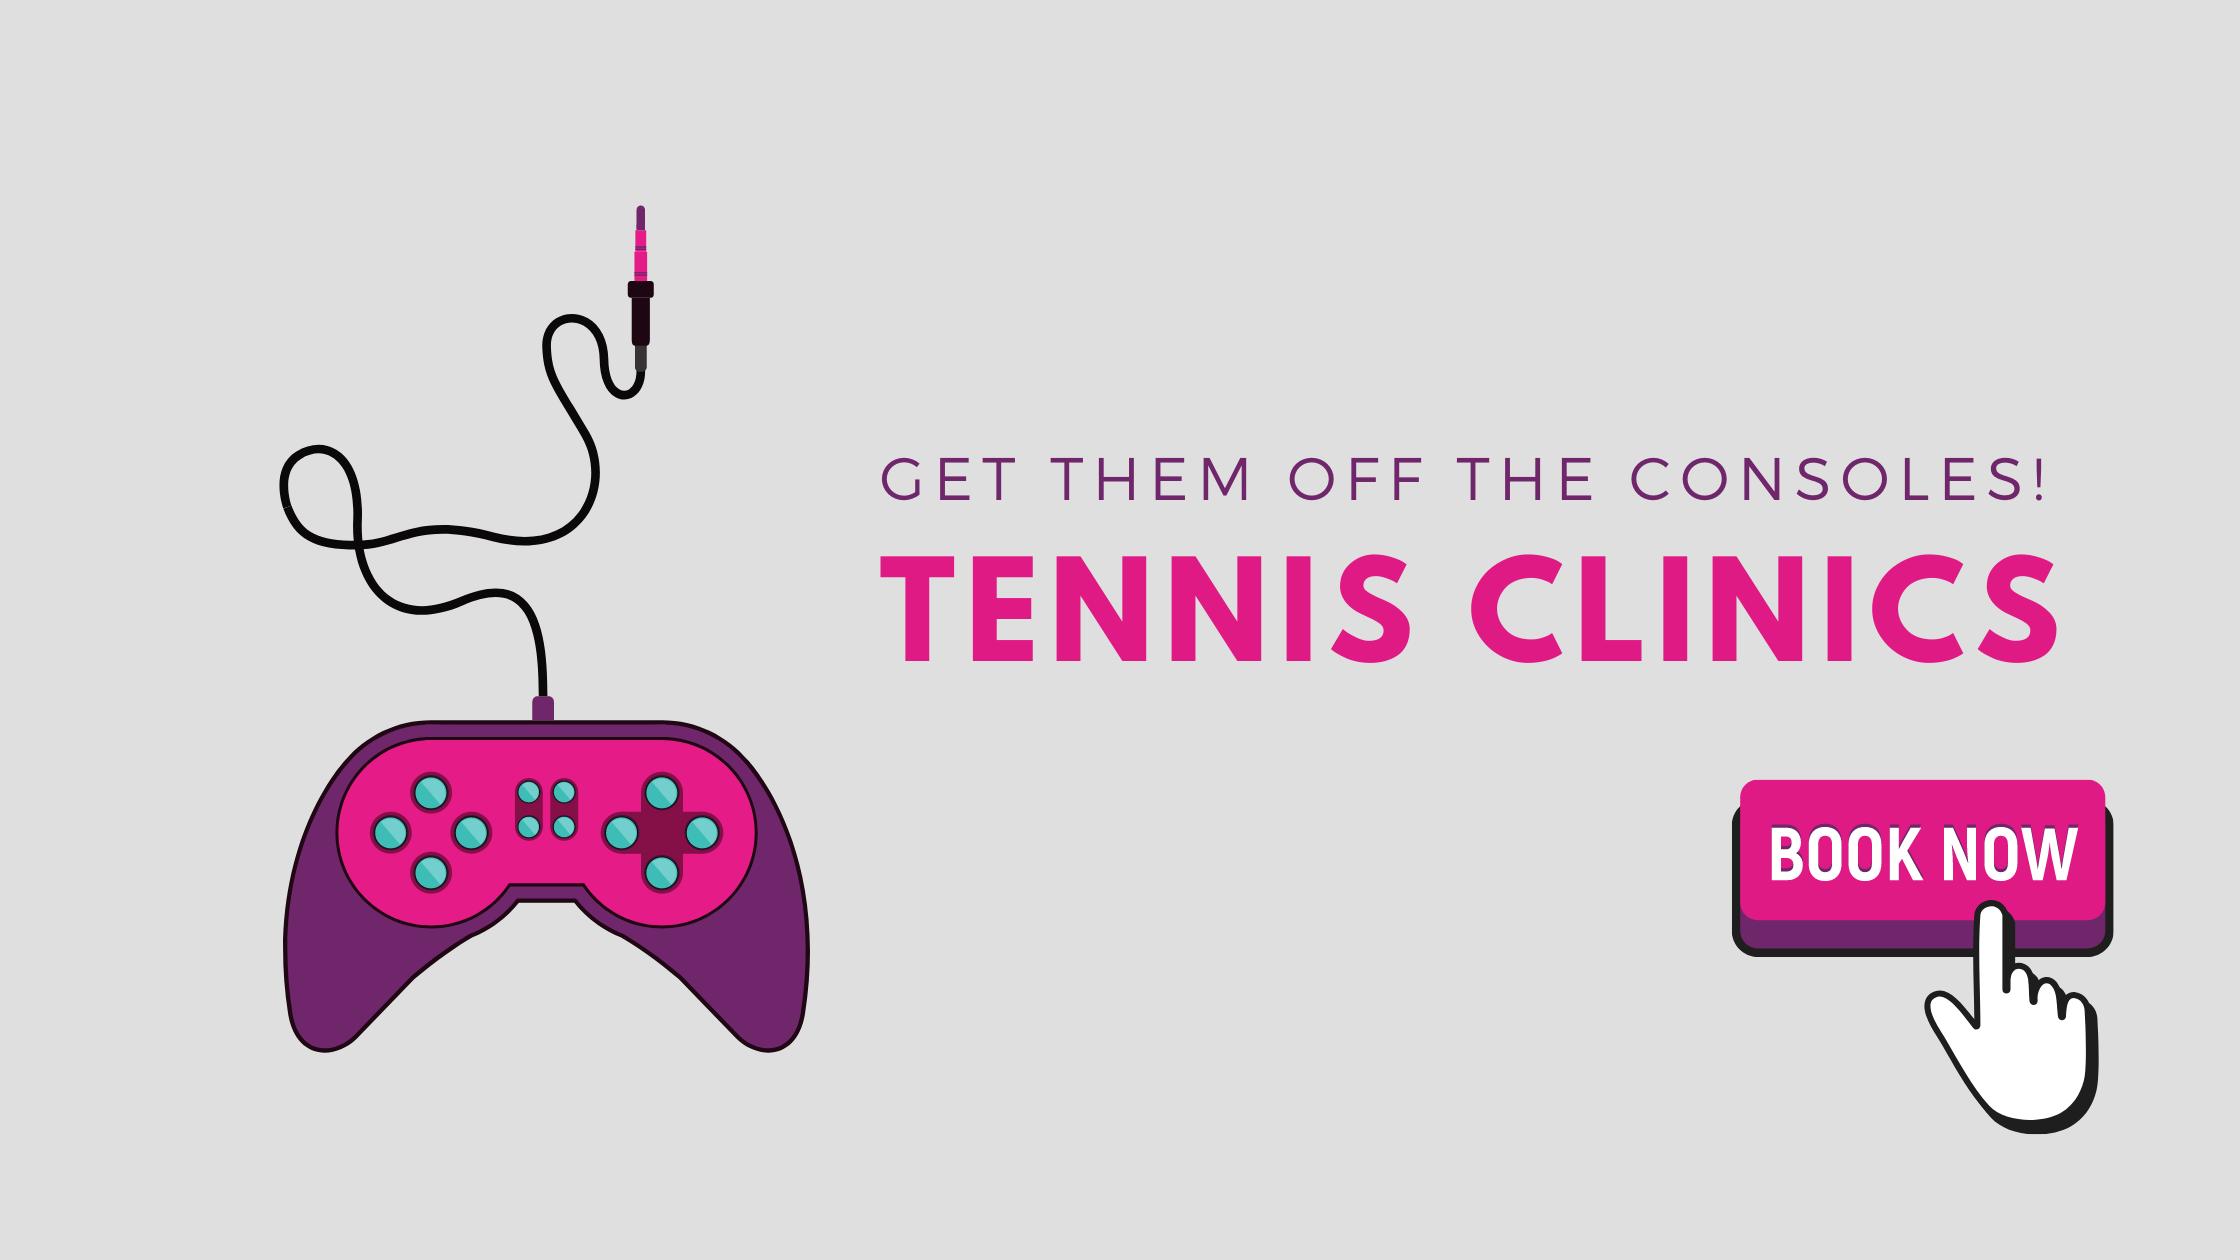 Holiday Tennis Clinics